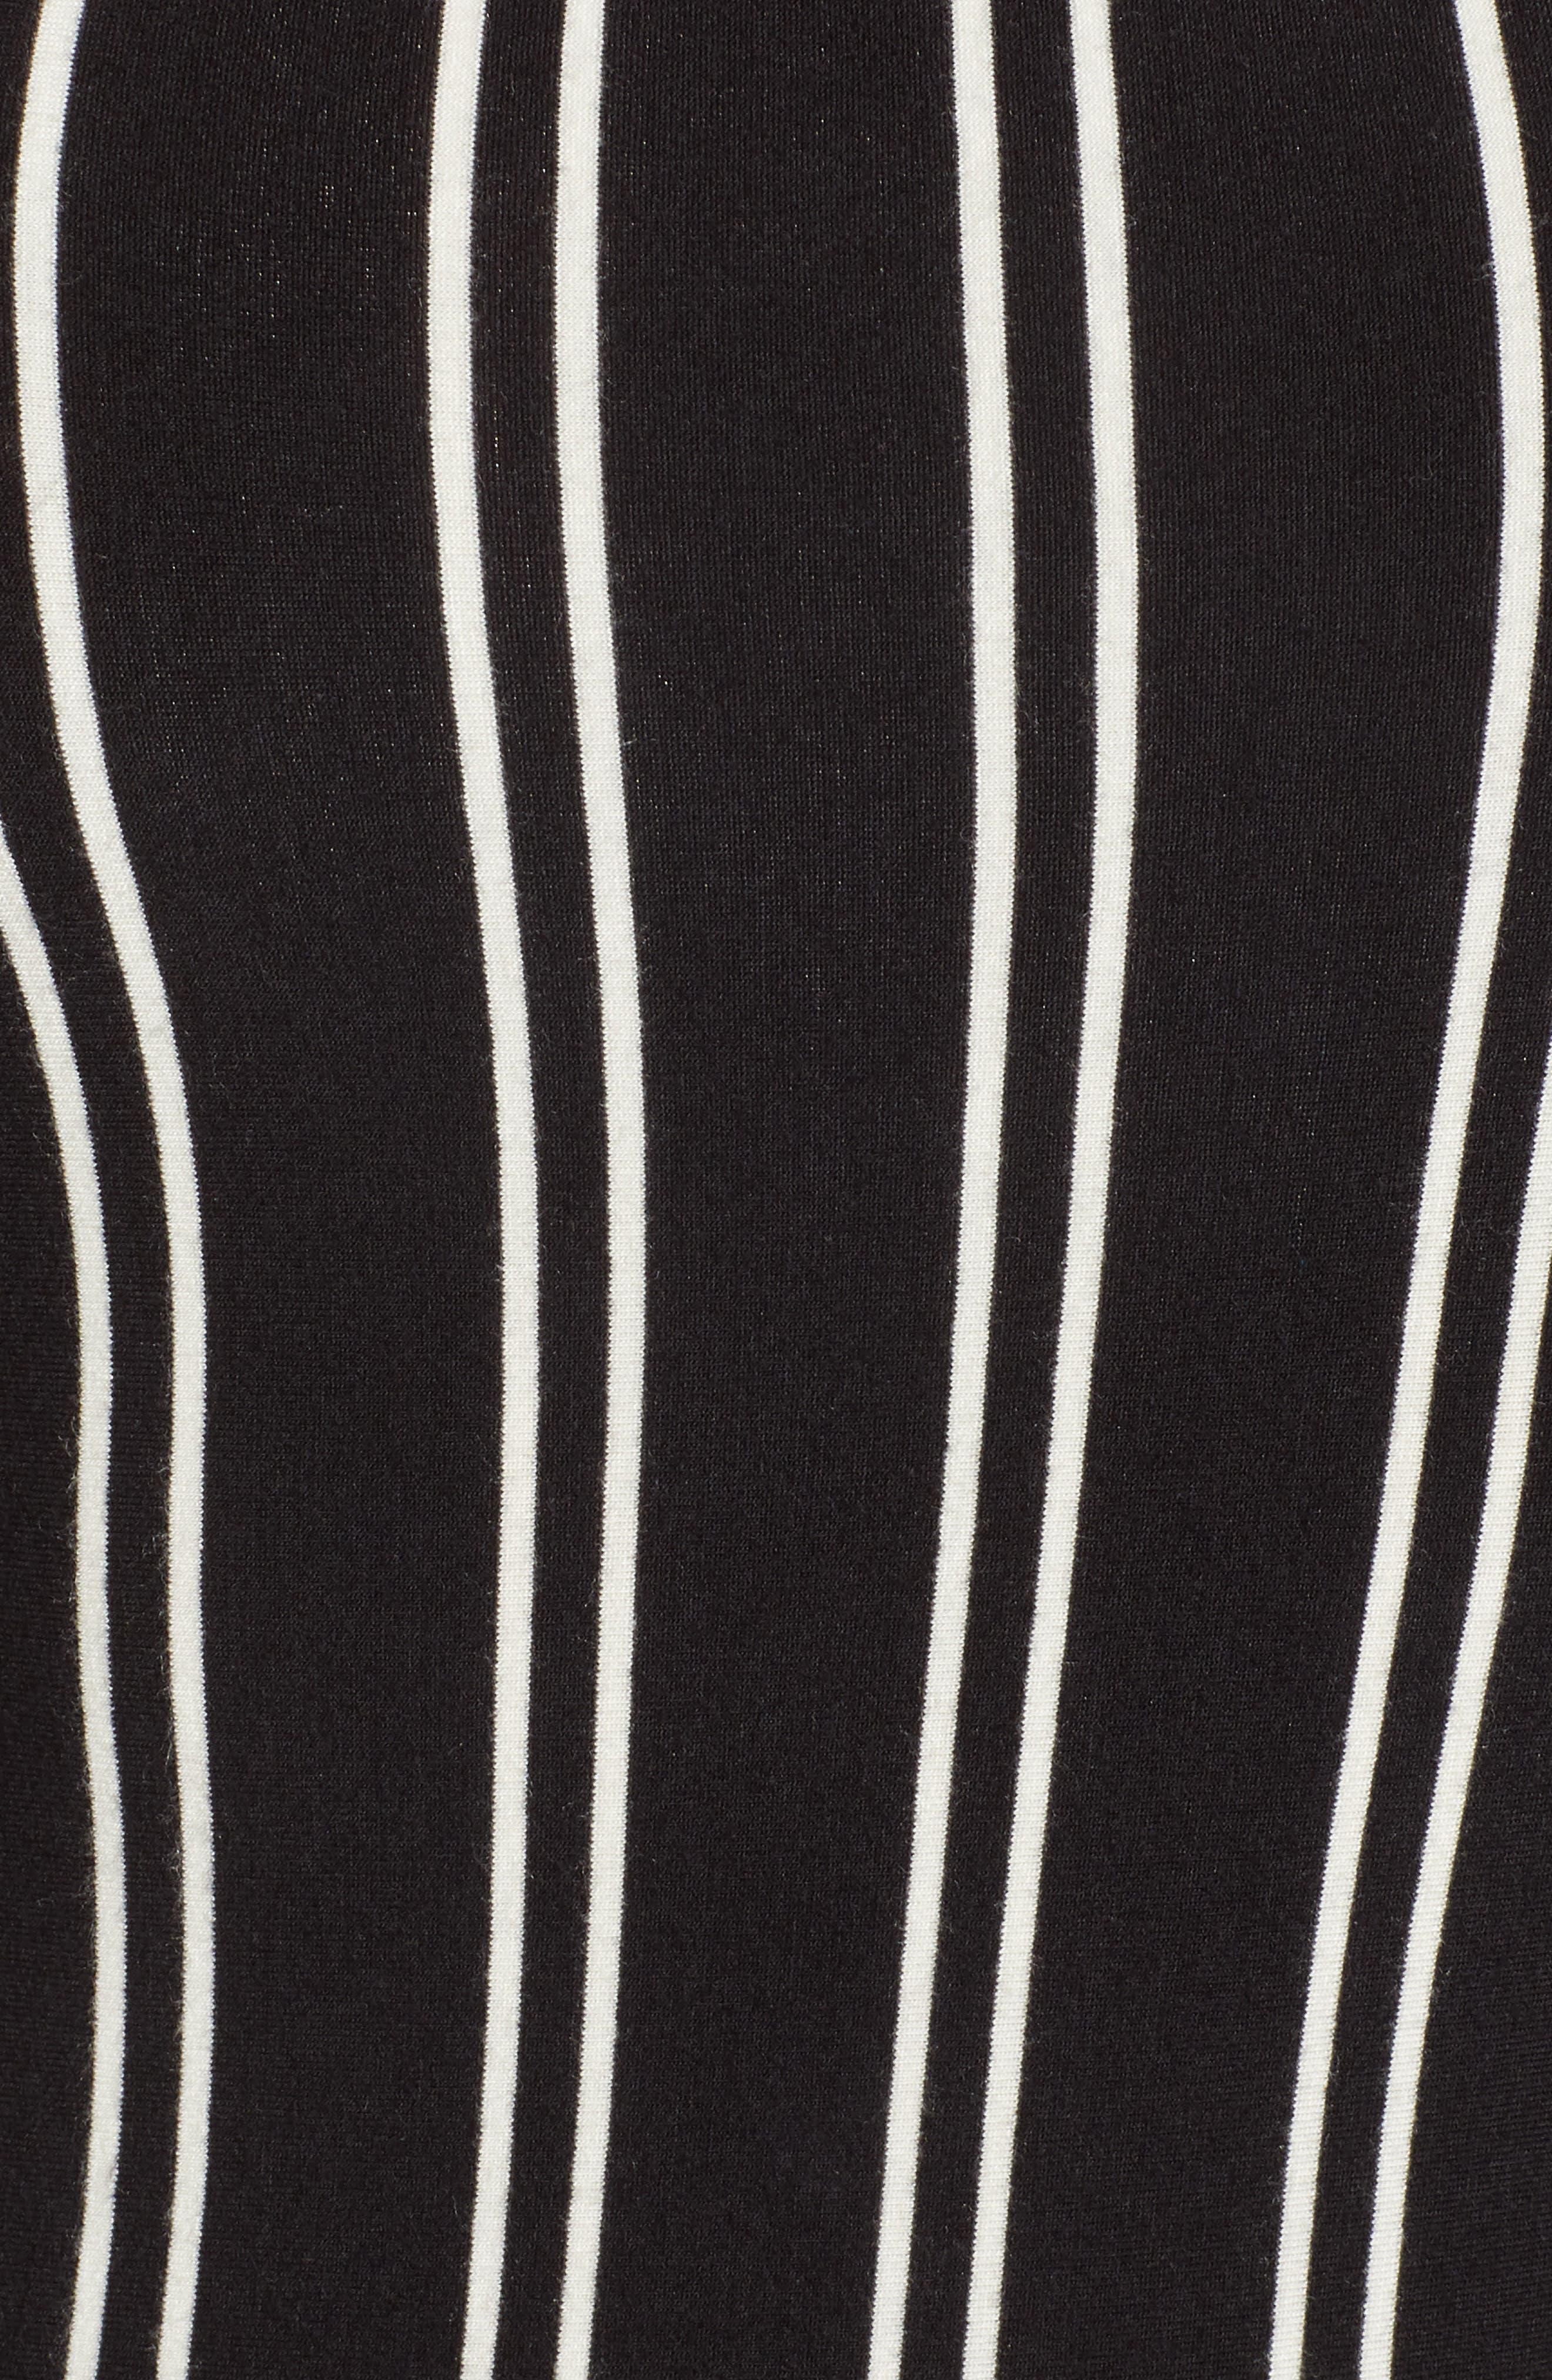 Lockette Stripe Bodysuit,                             Alternate thumbnail 5, color,                             005